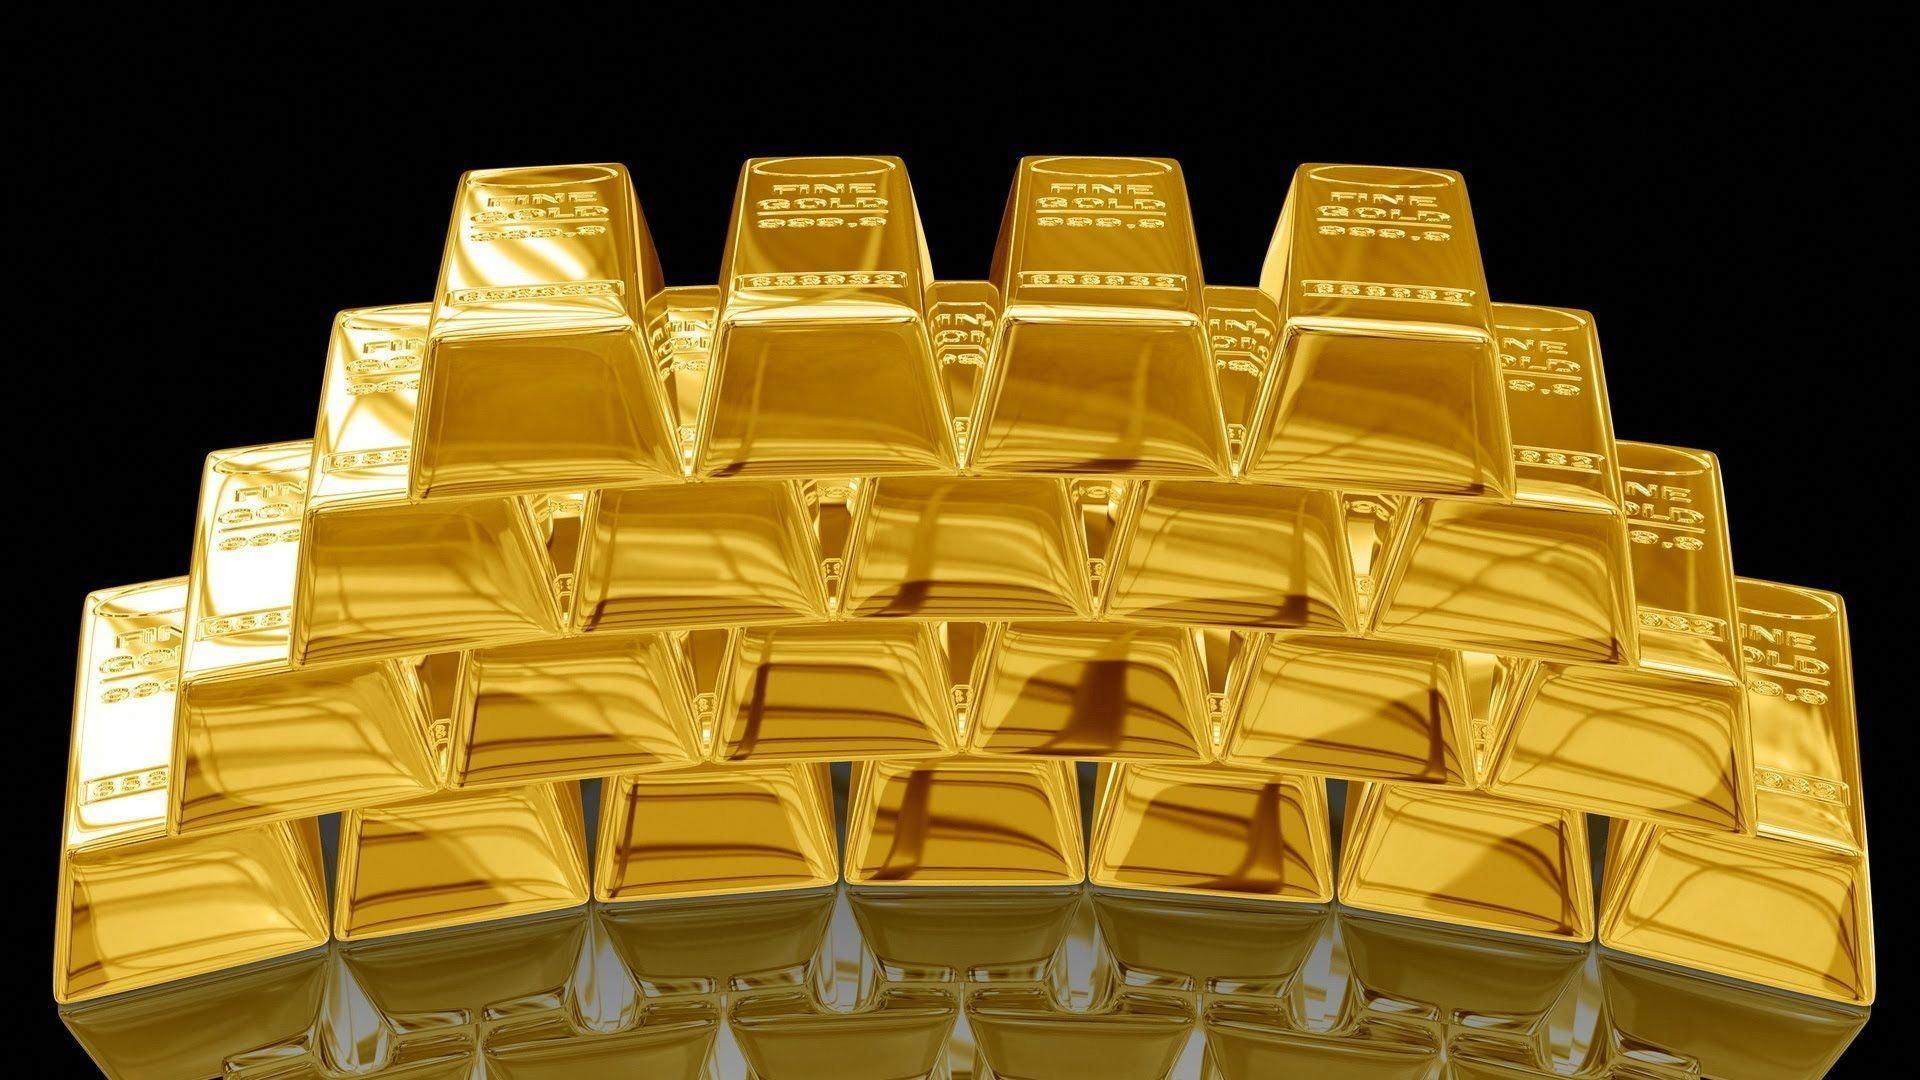 Liked On Youtube Invest Precious Metals Companies Goldbullionbars Huile Menthe Poivree Circulation Sanguine Grain De Cafe